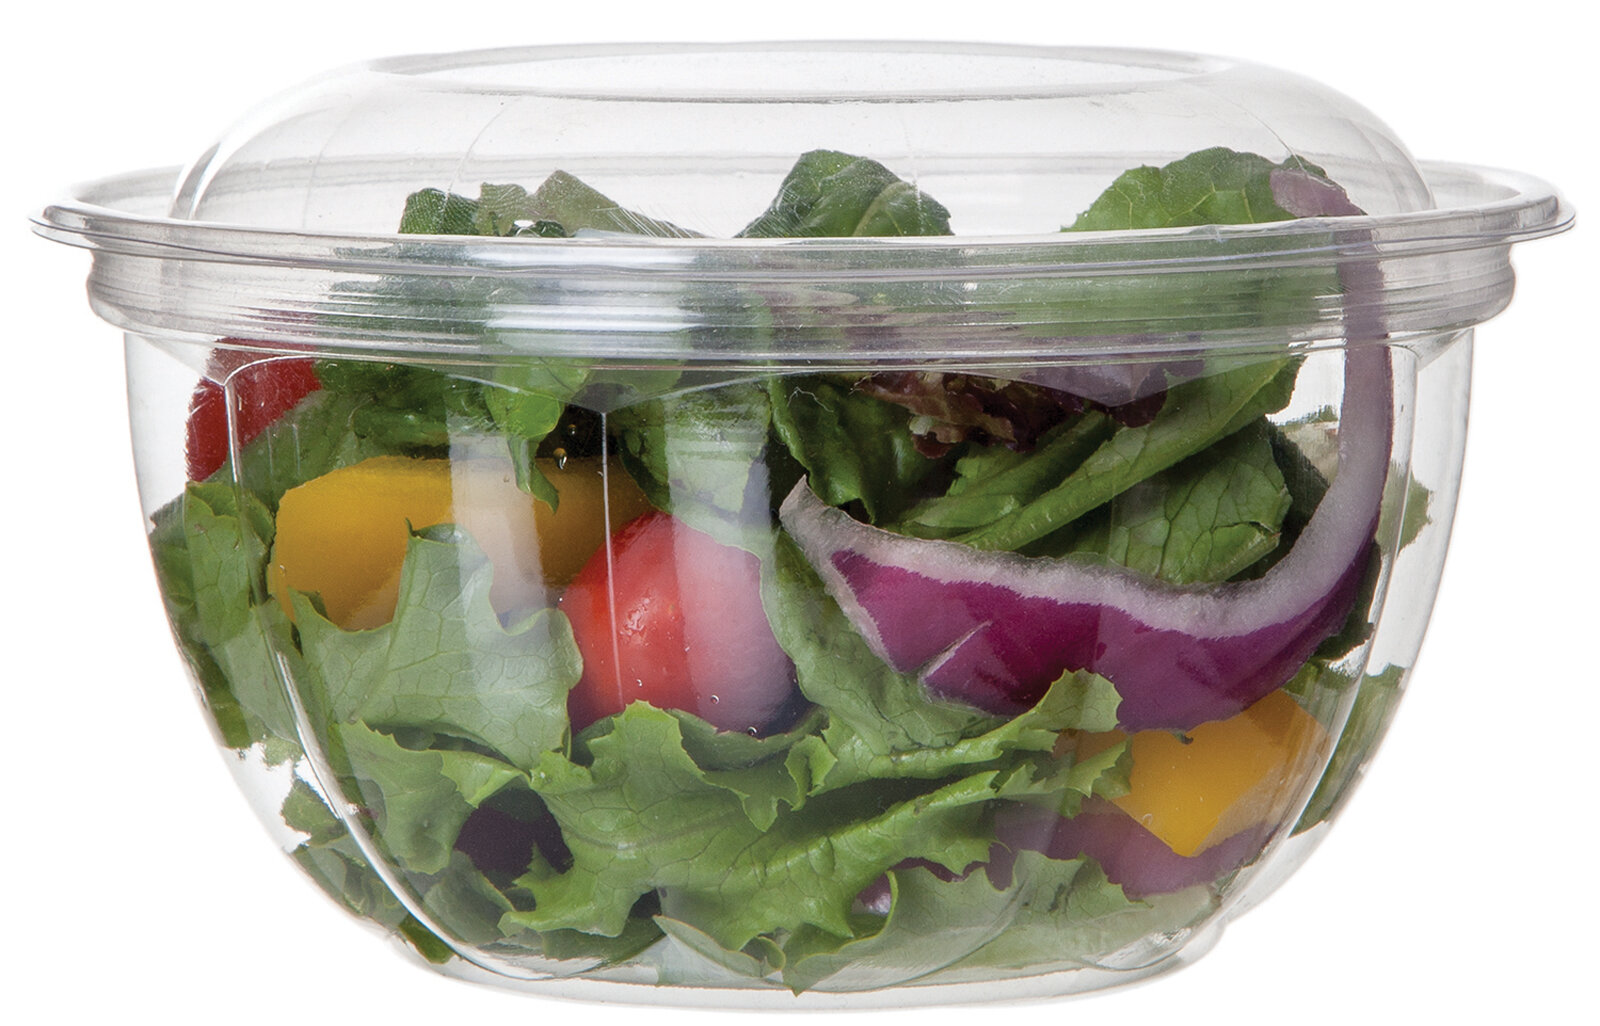 Biodegradable Salad Bowls